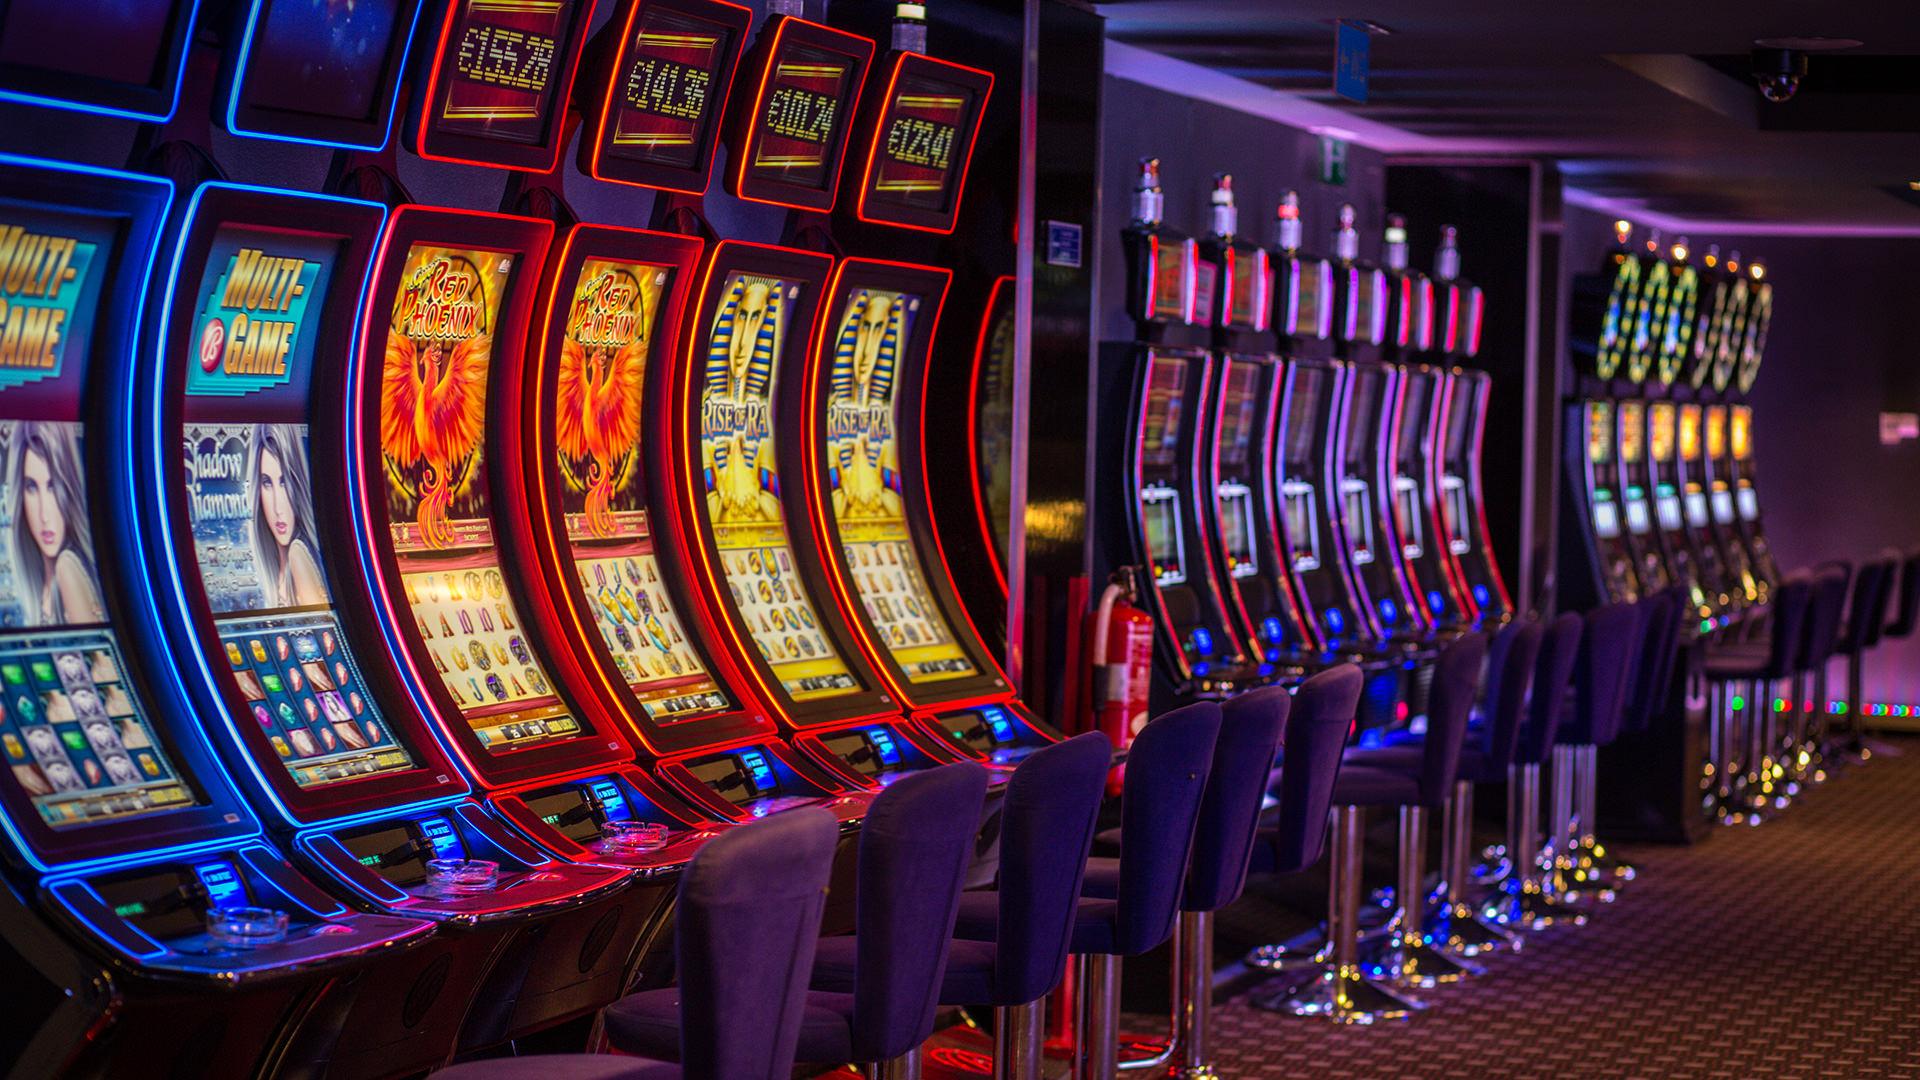 метод хока виртуальное казино форум